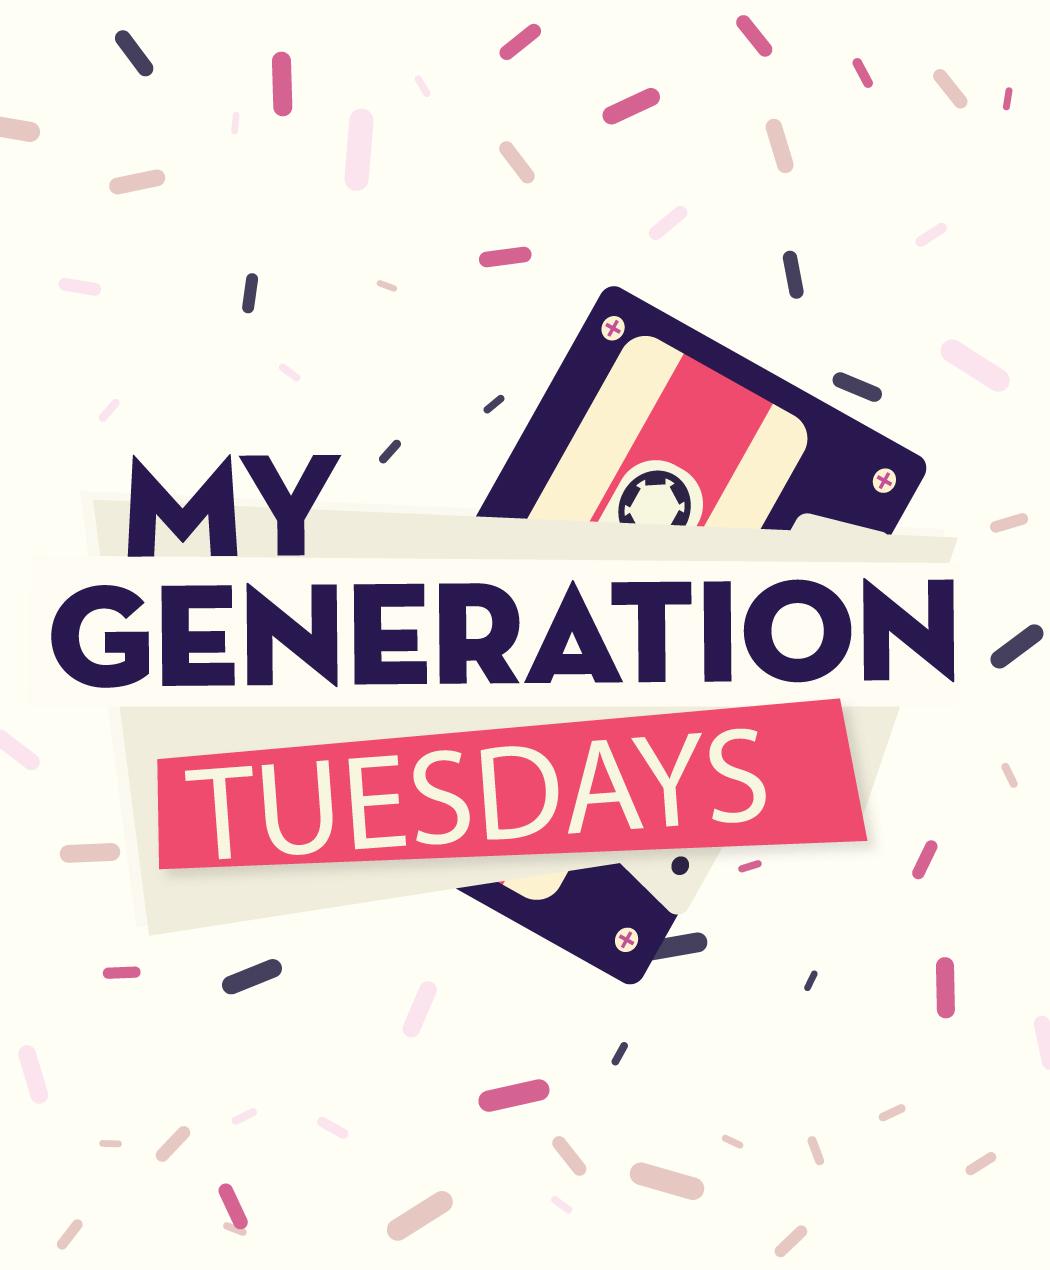 My Generation Tuesdays